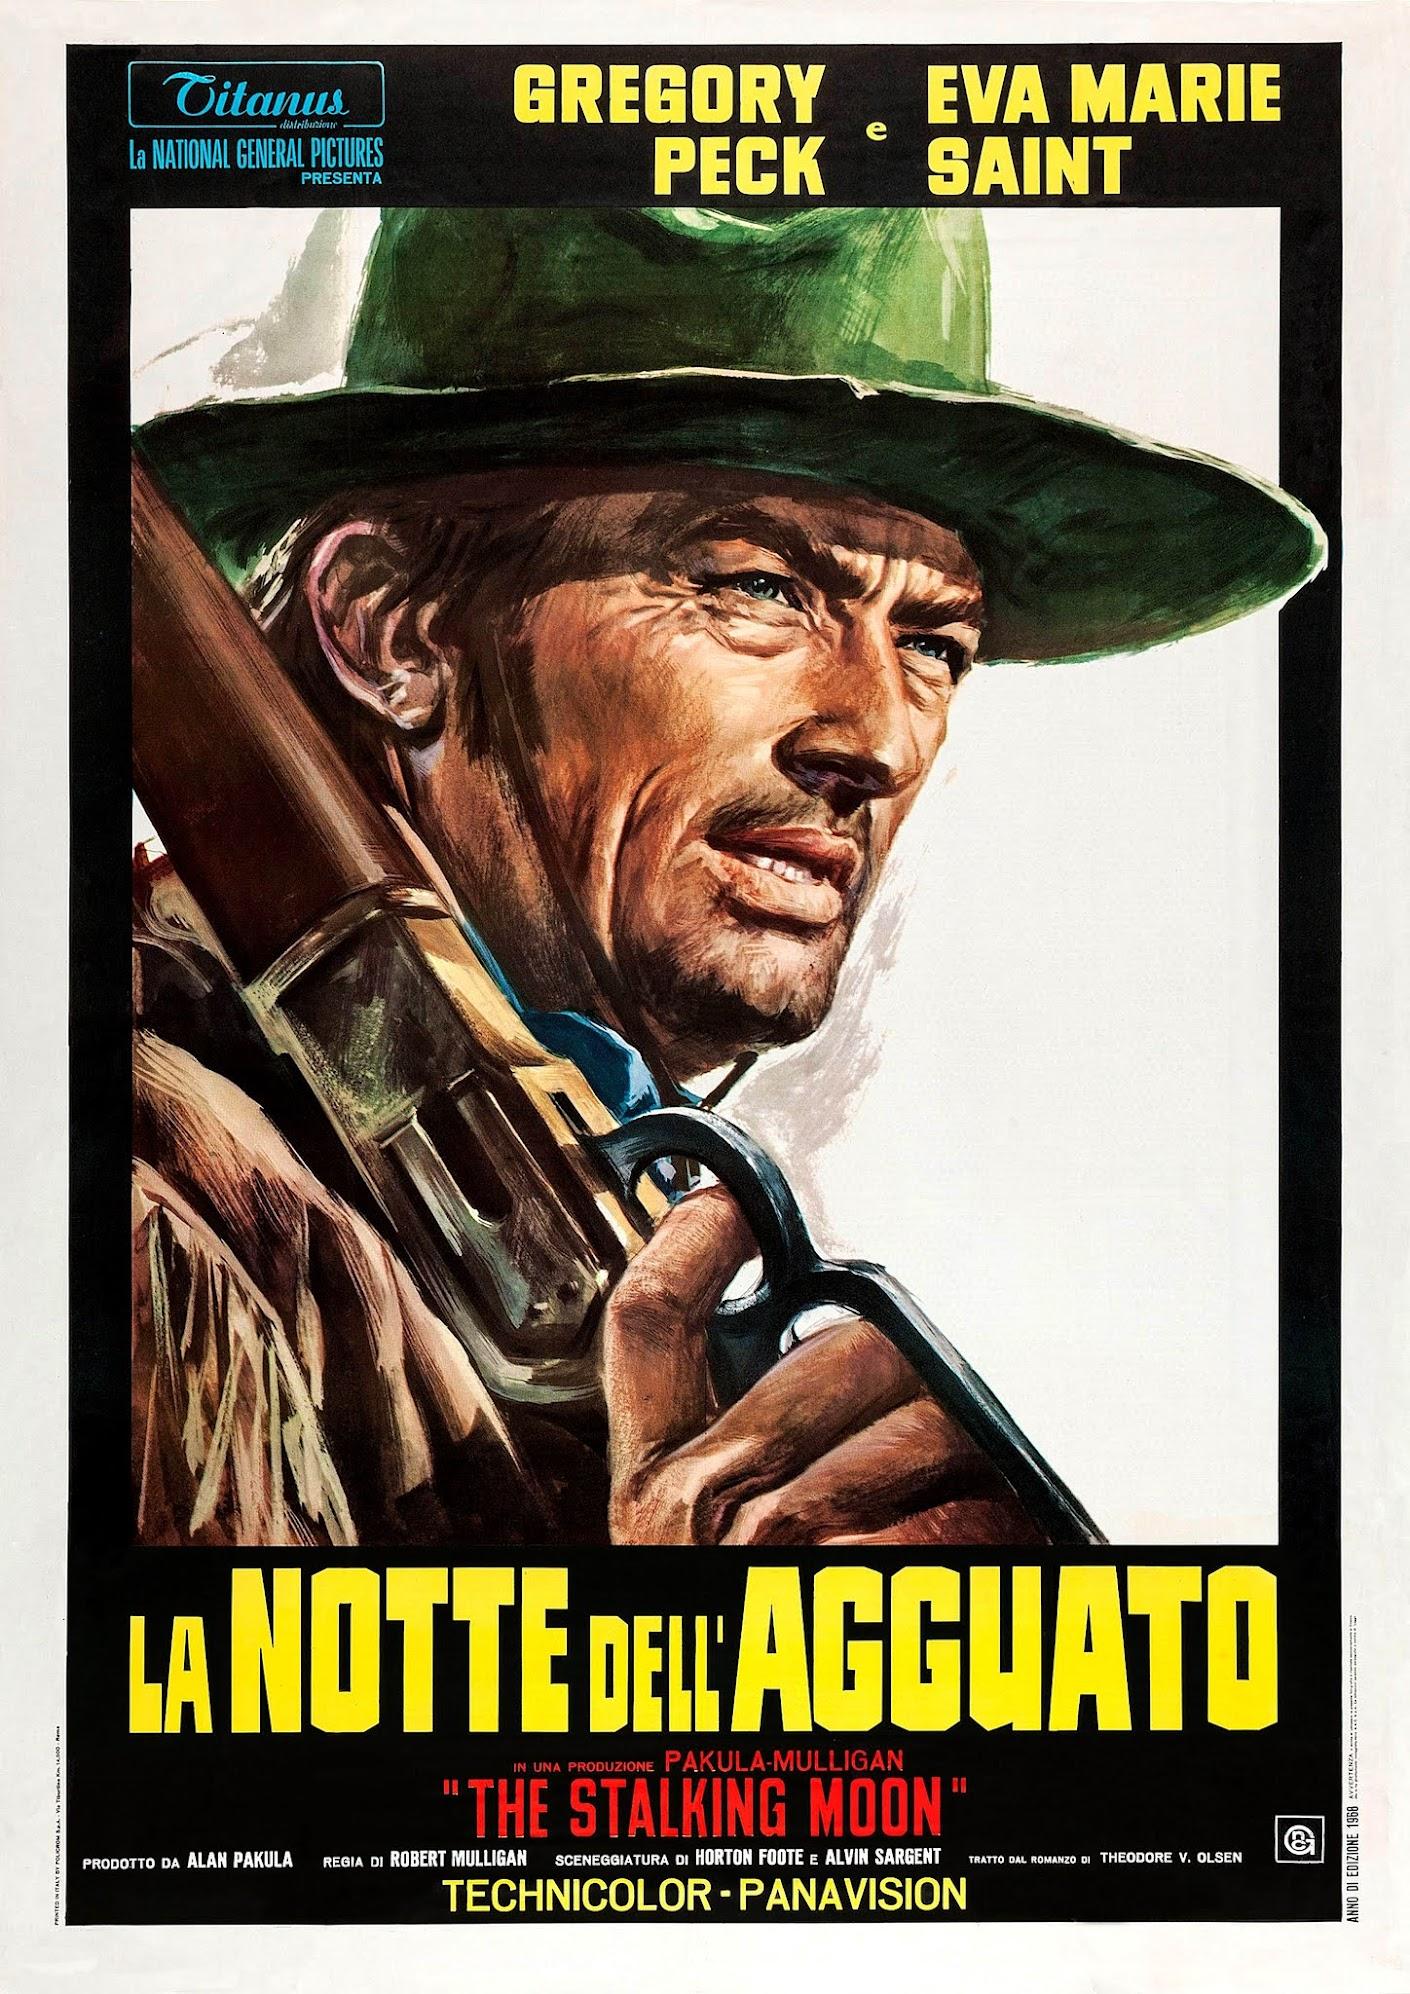 L'homme sauvage (1968) Robert Mulligan - The stalking moon (09.01.1968 / 1968)